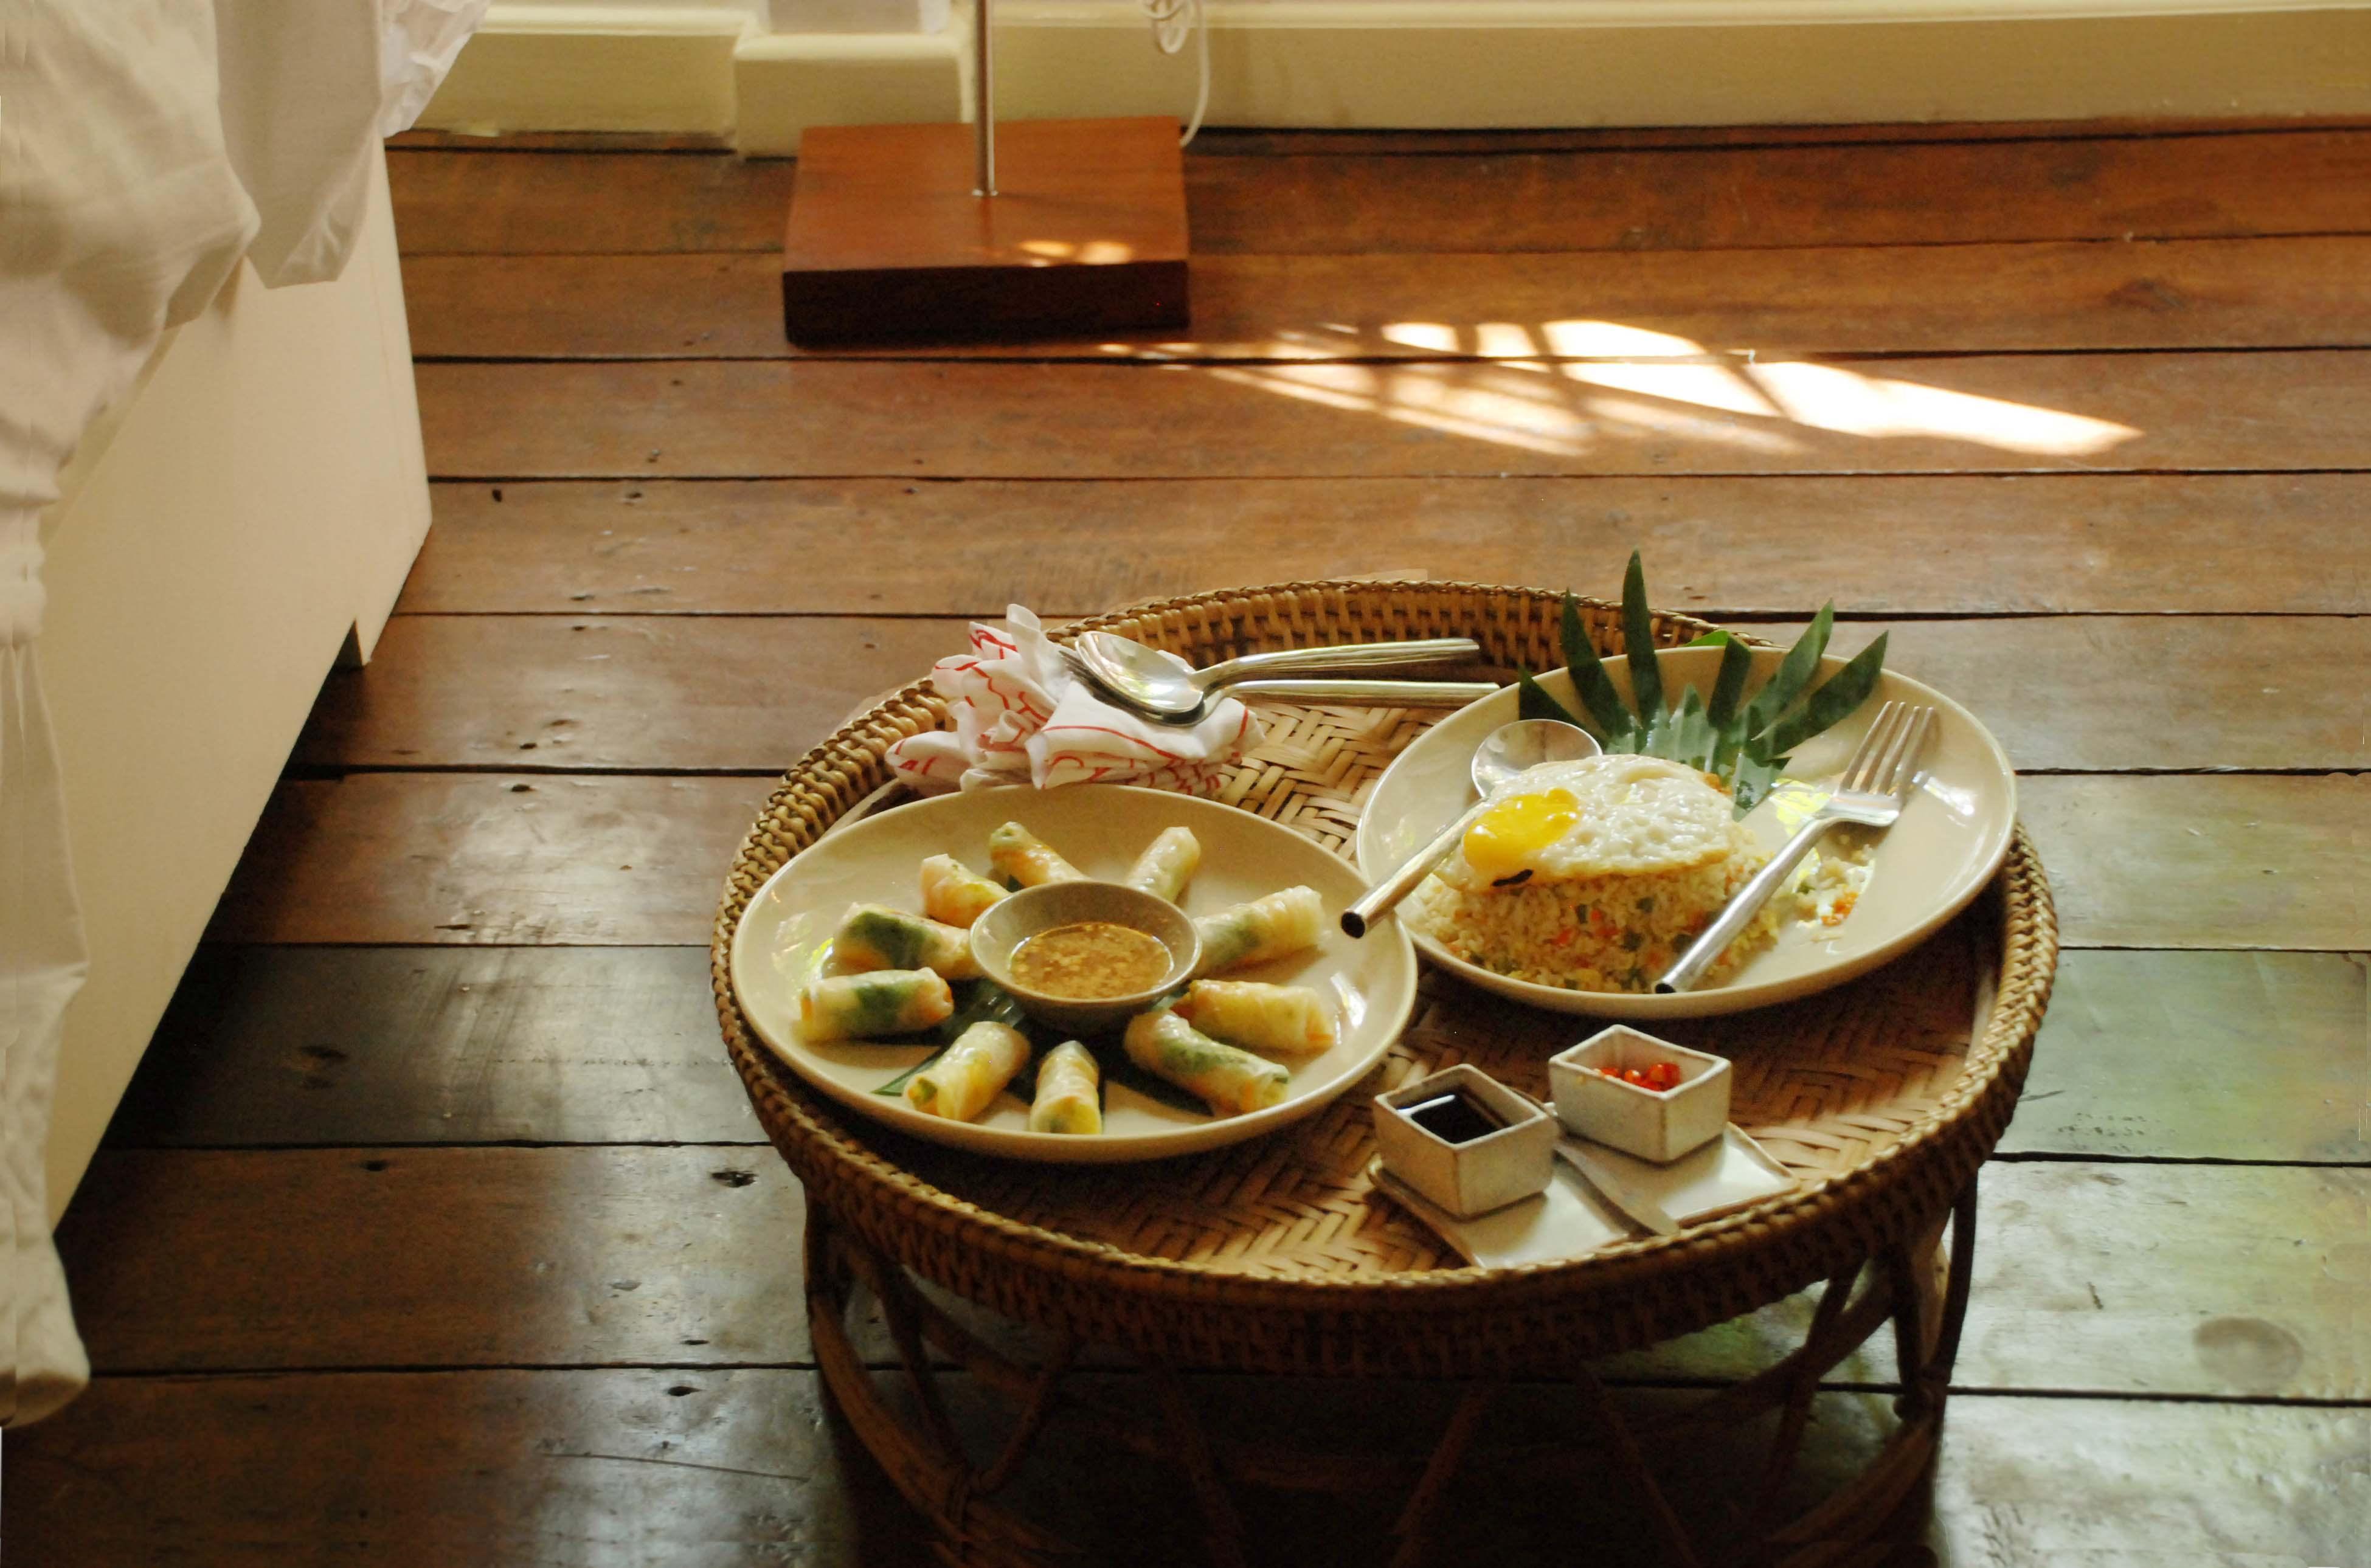 Maison Polanka的廚師擅長傳統家庭料理,客房服務的餐點非常美味 (Photographer: Ran)